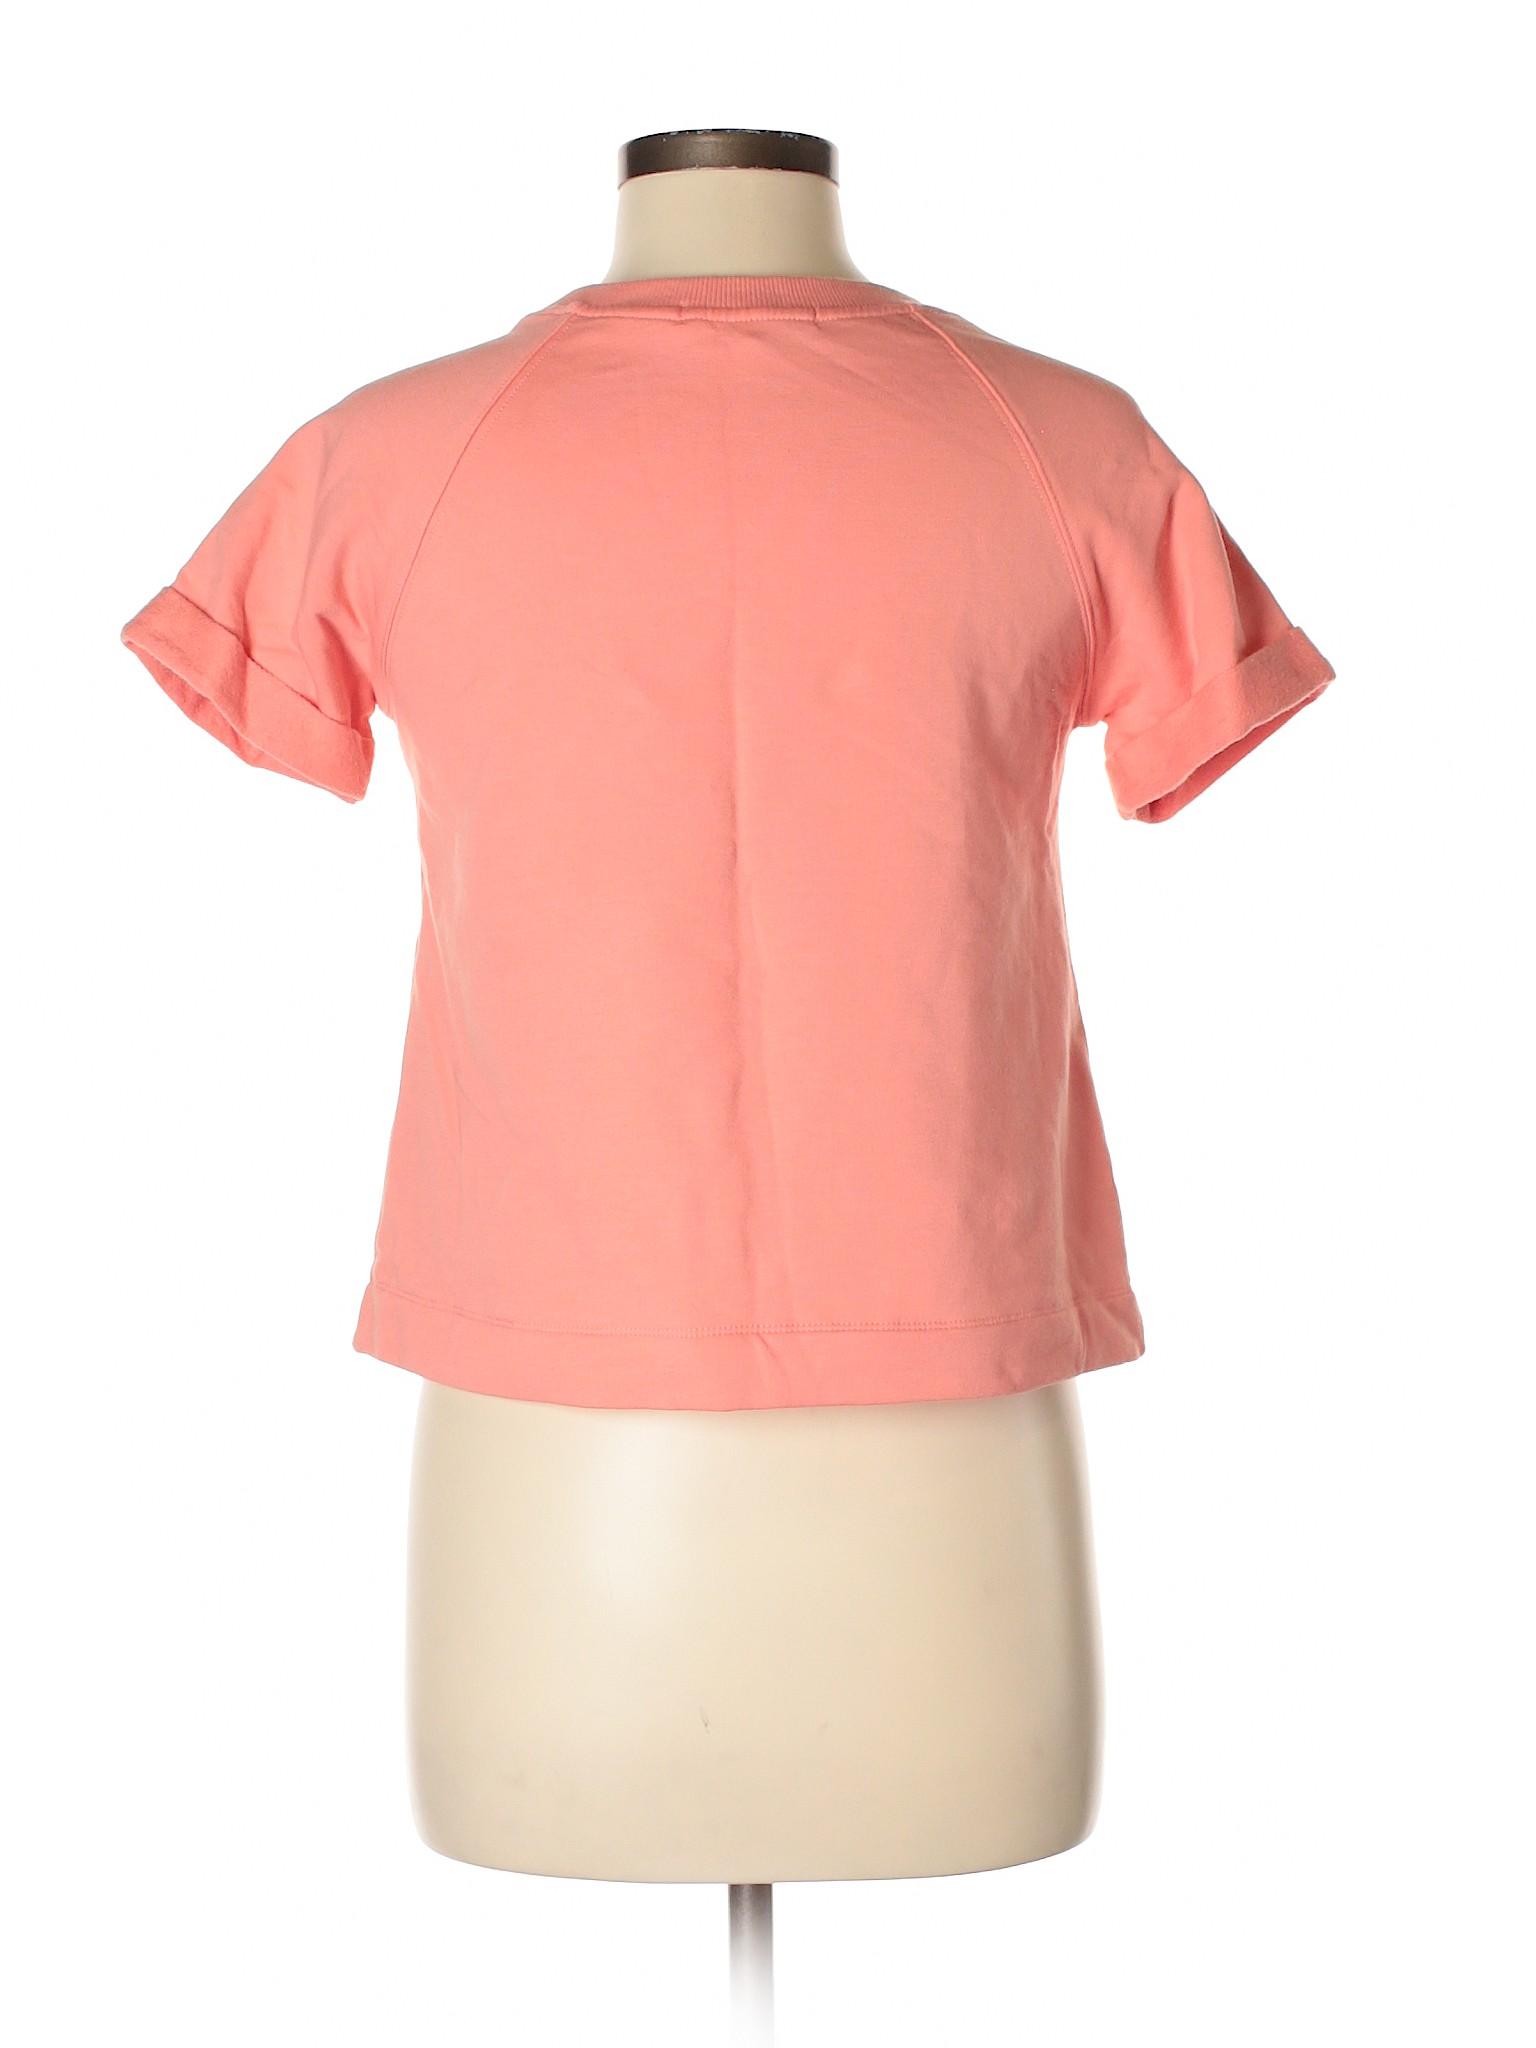 Boutique Boutique Sweater Eri Pullover Eri Ali Sweater Pullover Boutique Ali Eri grwOvg5xnq